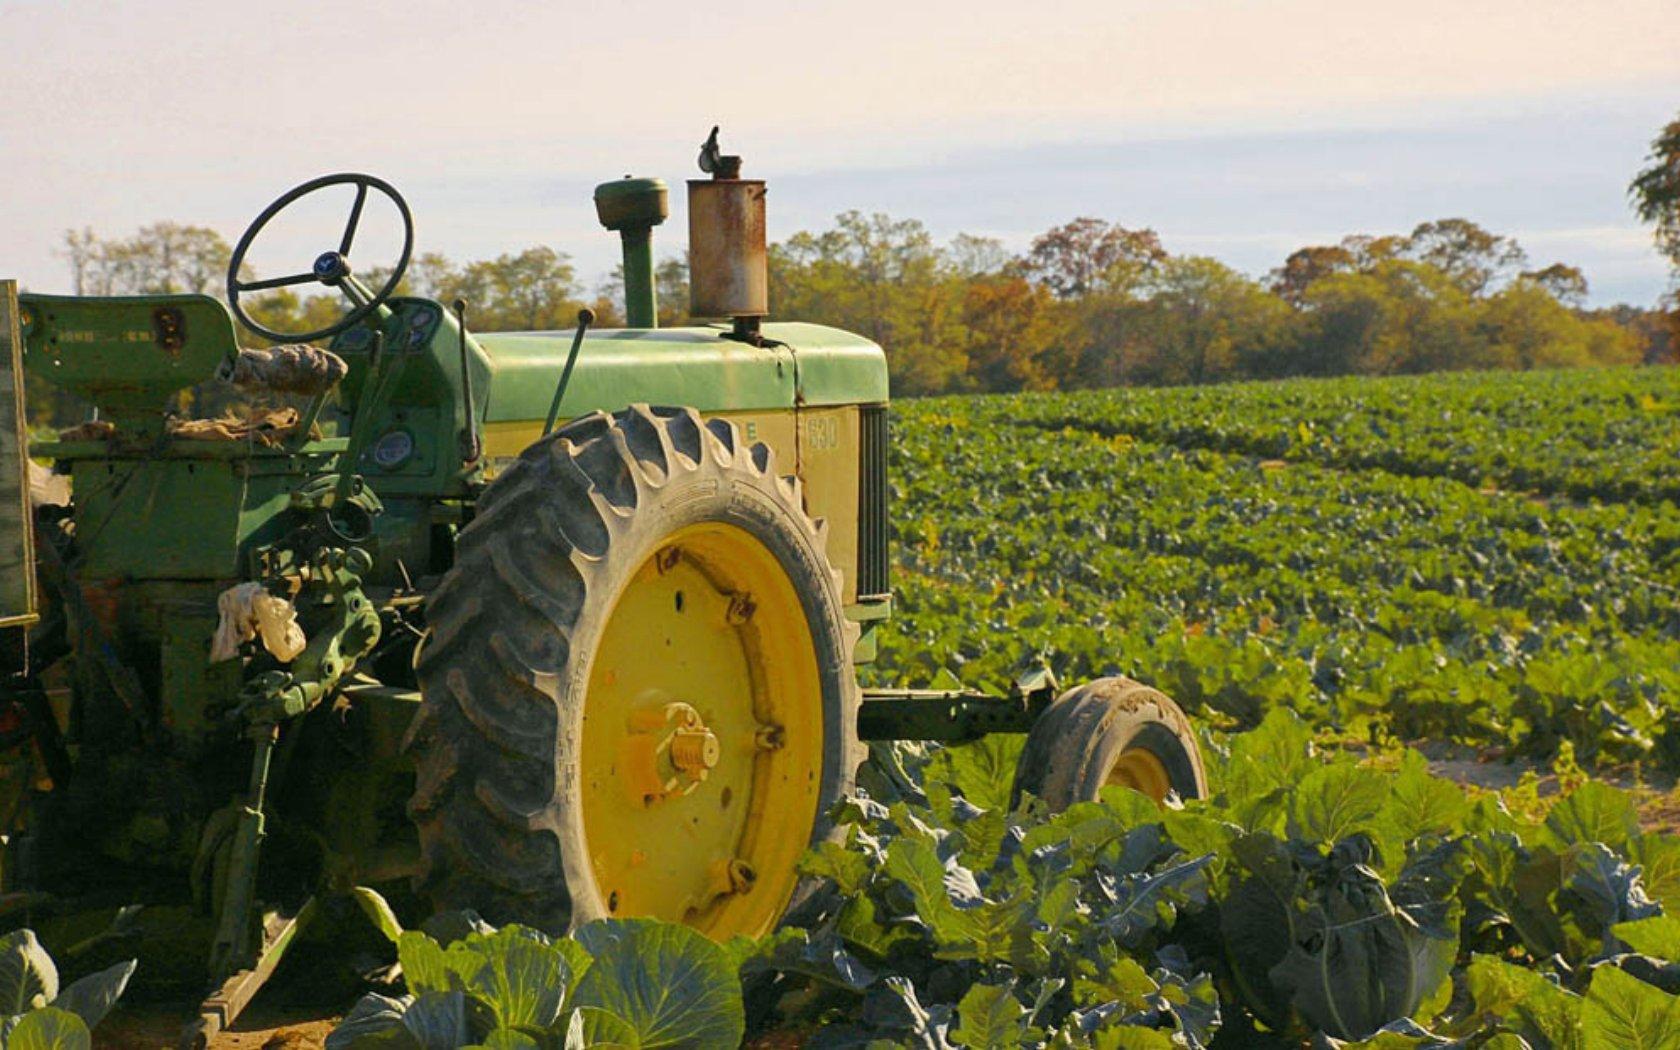 Farm Tractor Wallpaper HD wallpaper background 1680x1050